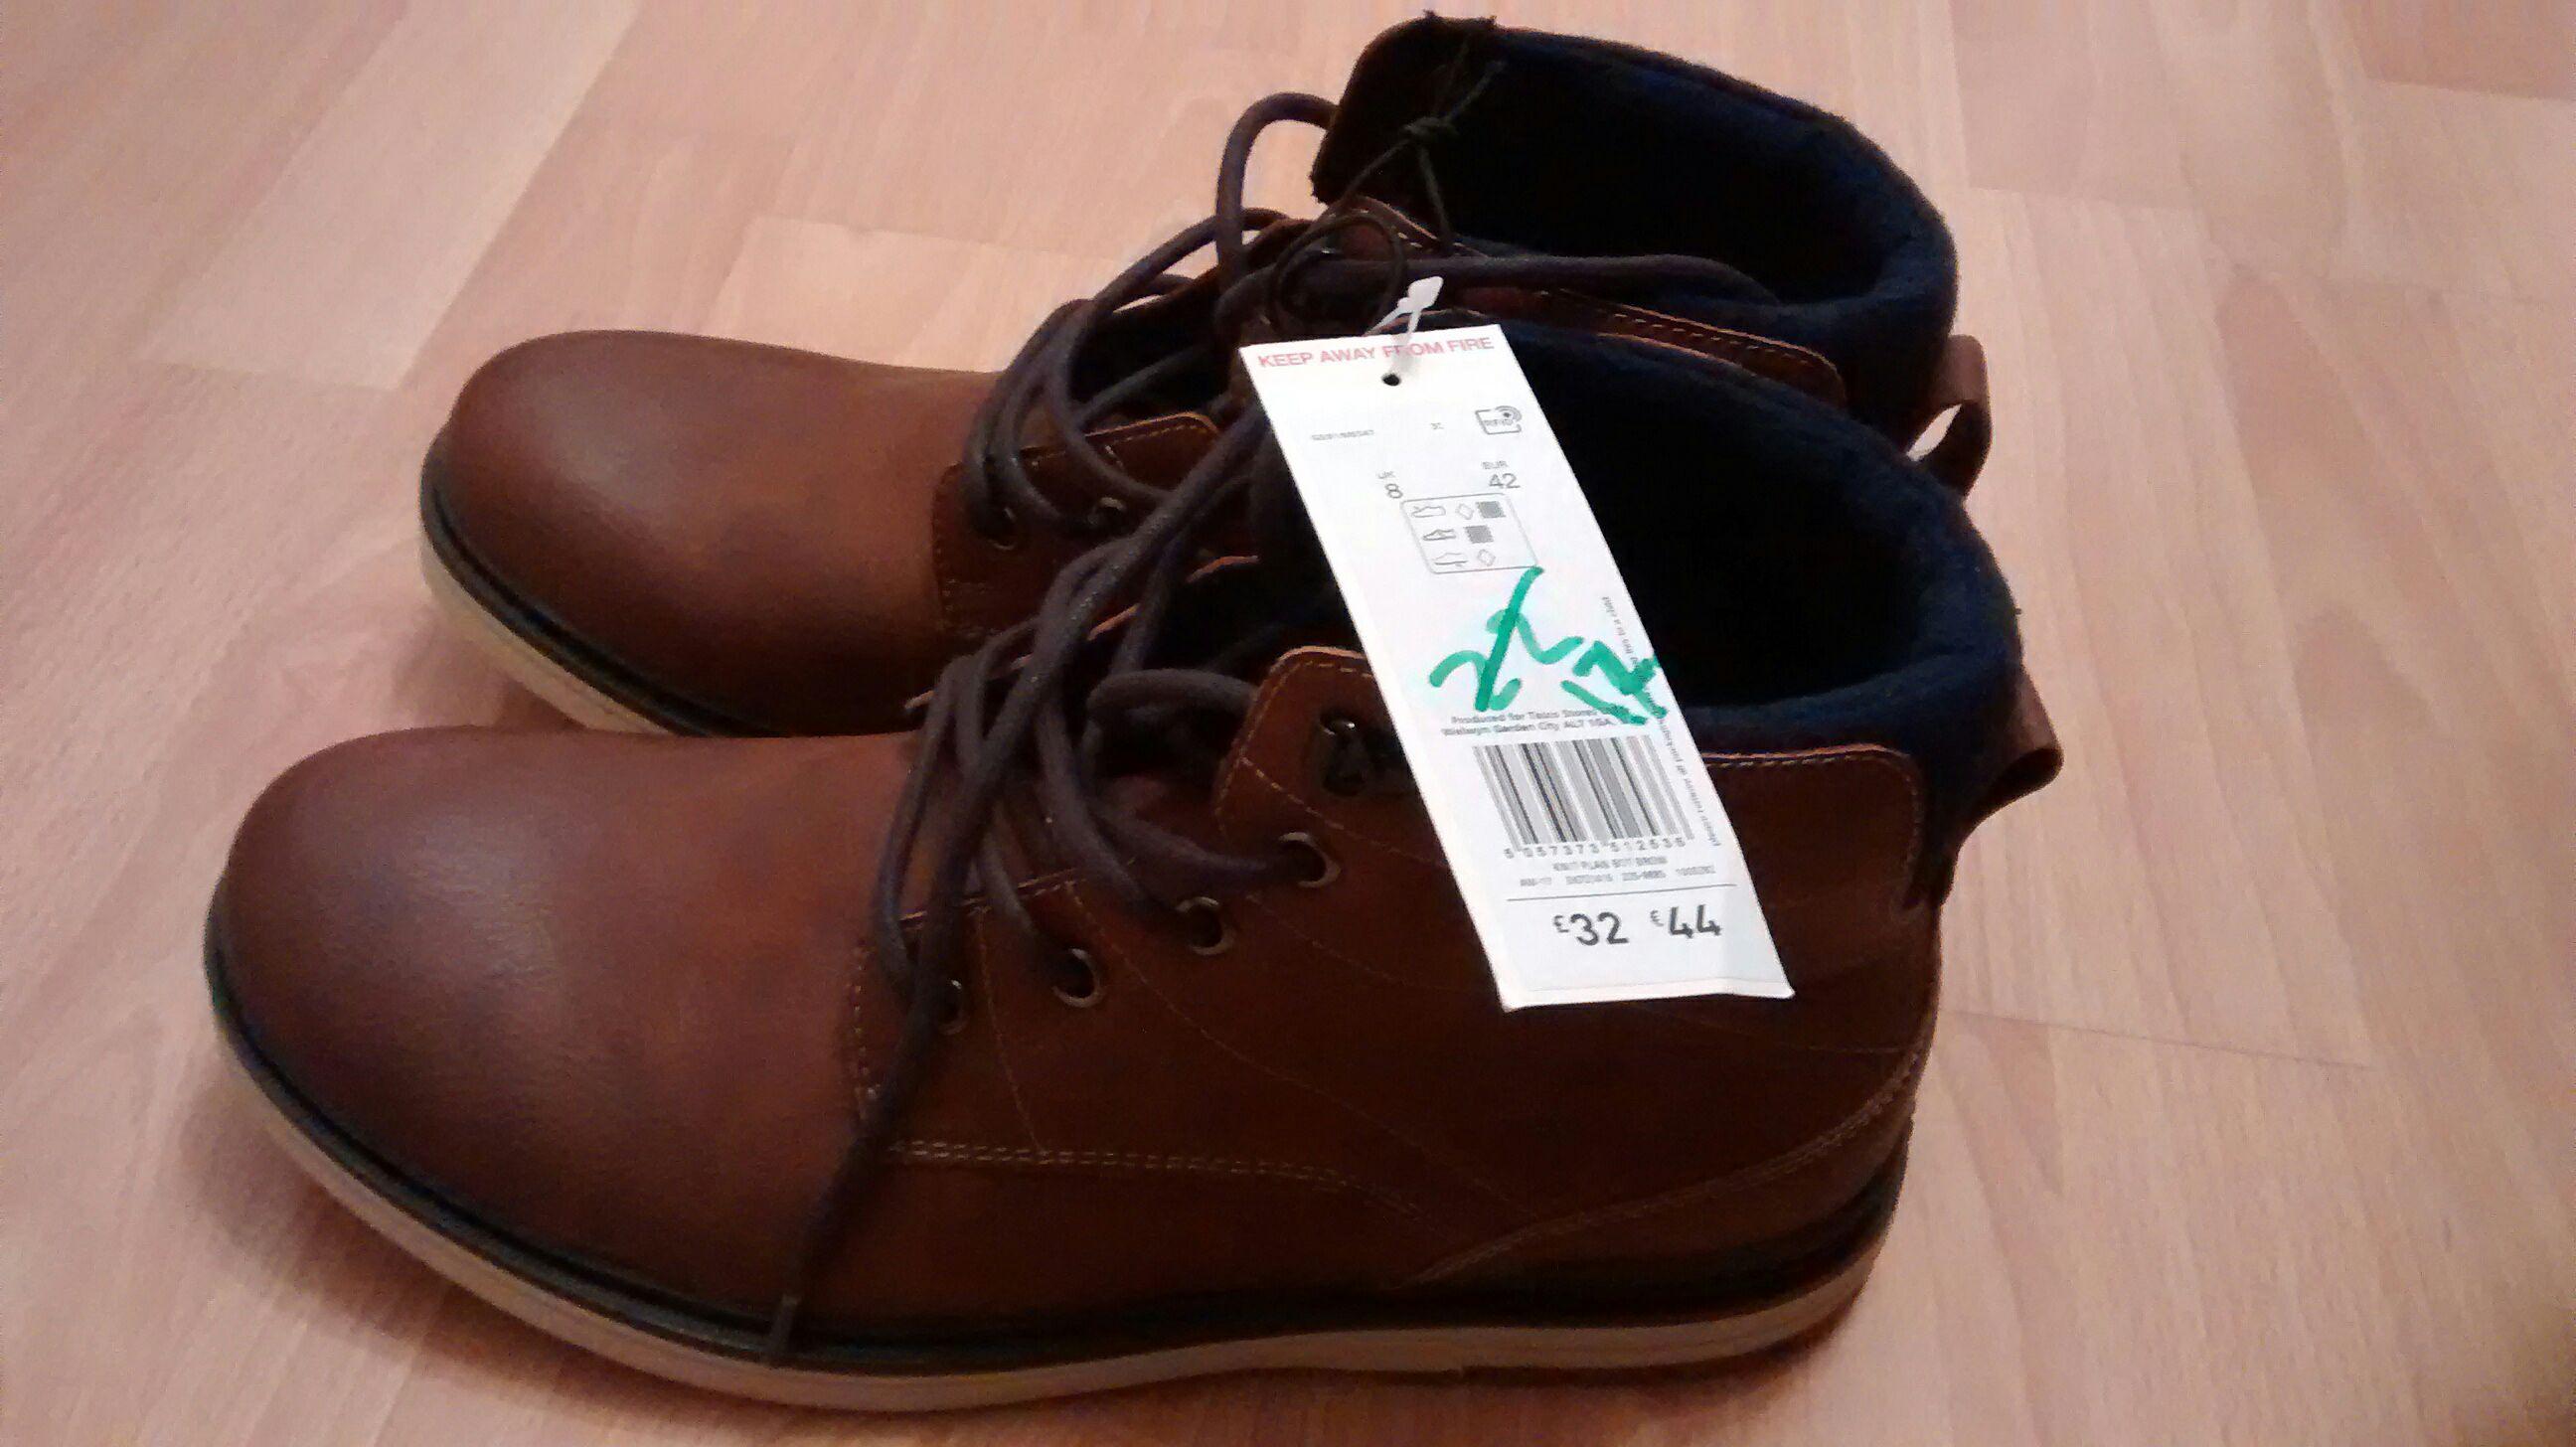 Men's boots - £12 instore @ Tesco (Coventry)